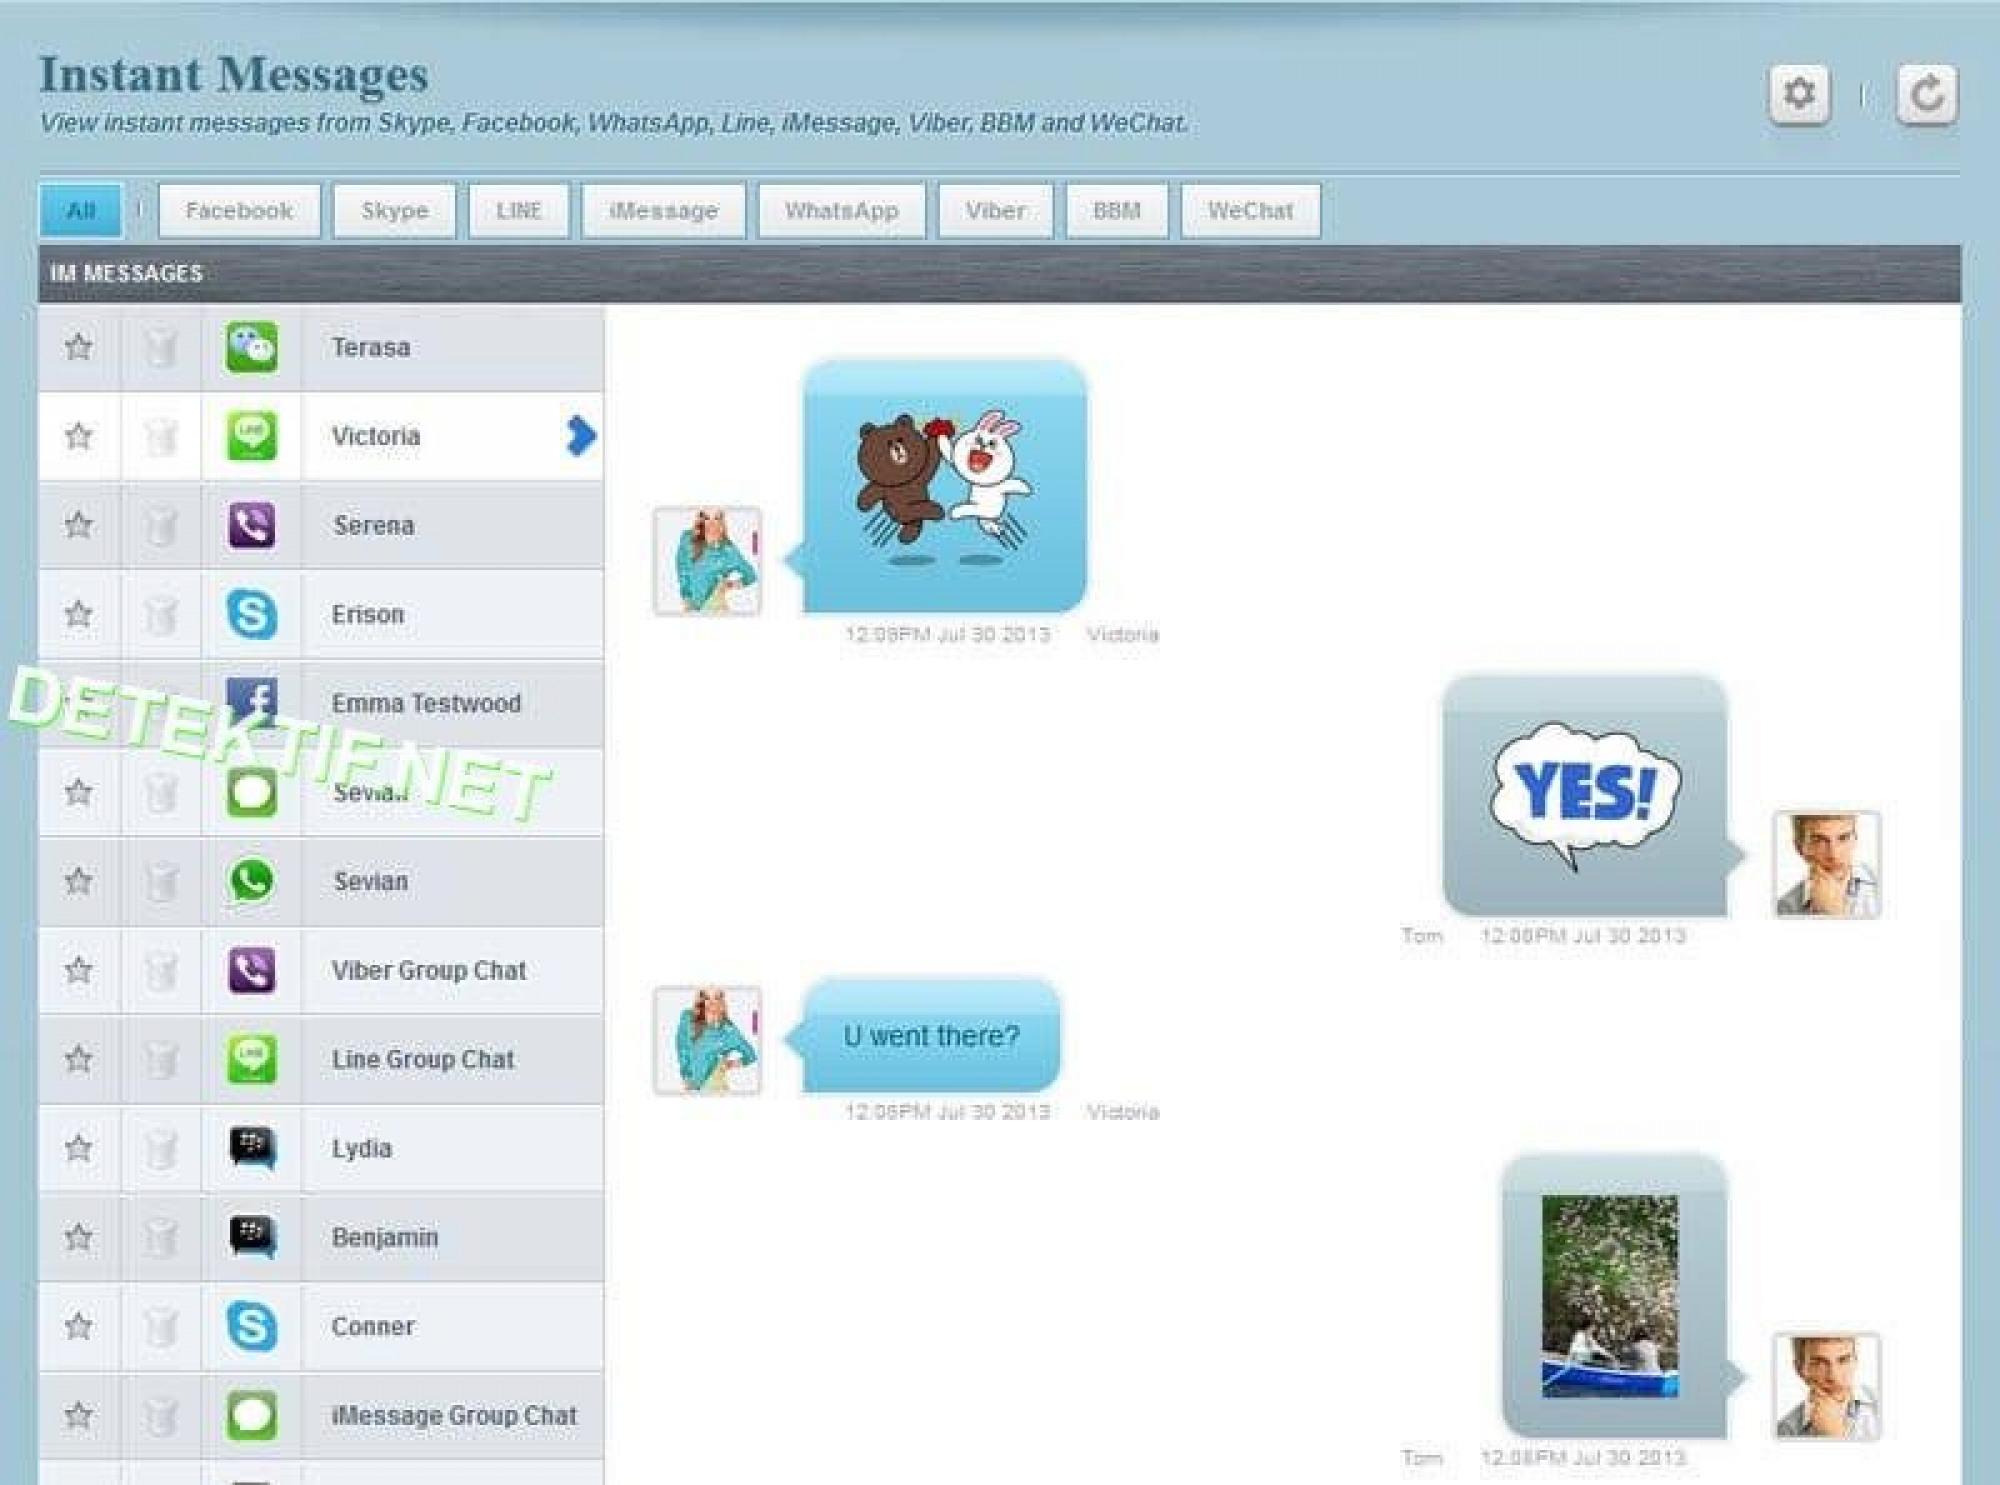 Sadap HP Jarak Jauh - WhatsApp, FB, & Telegram (FlexiSpy)